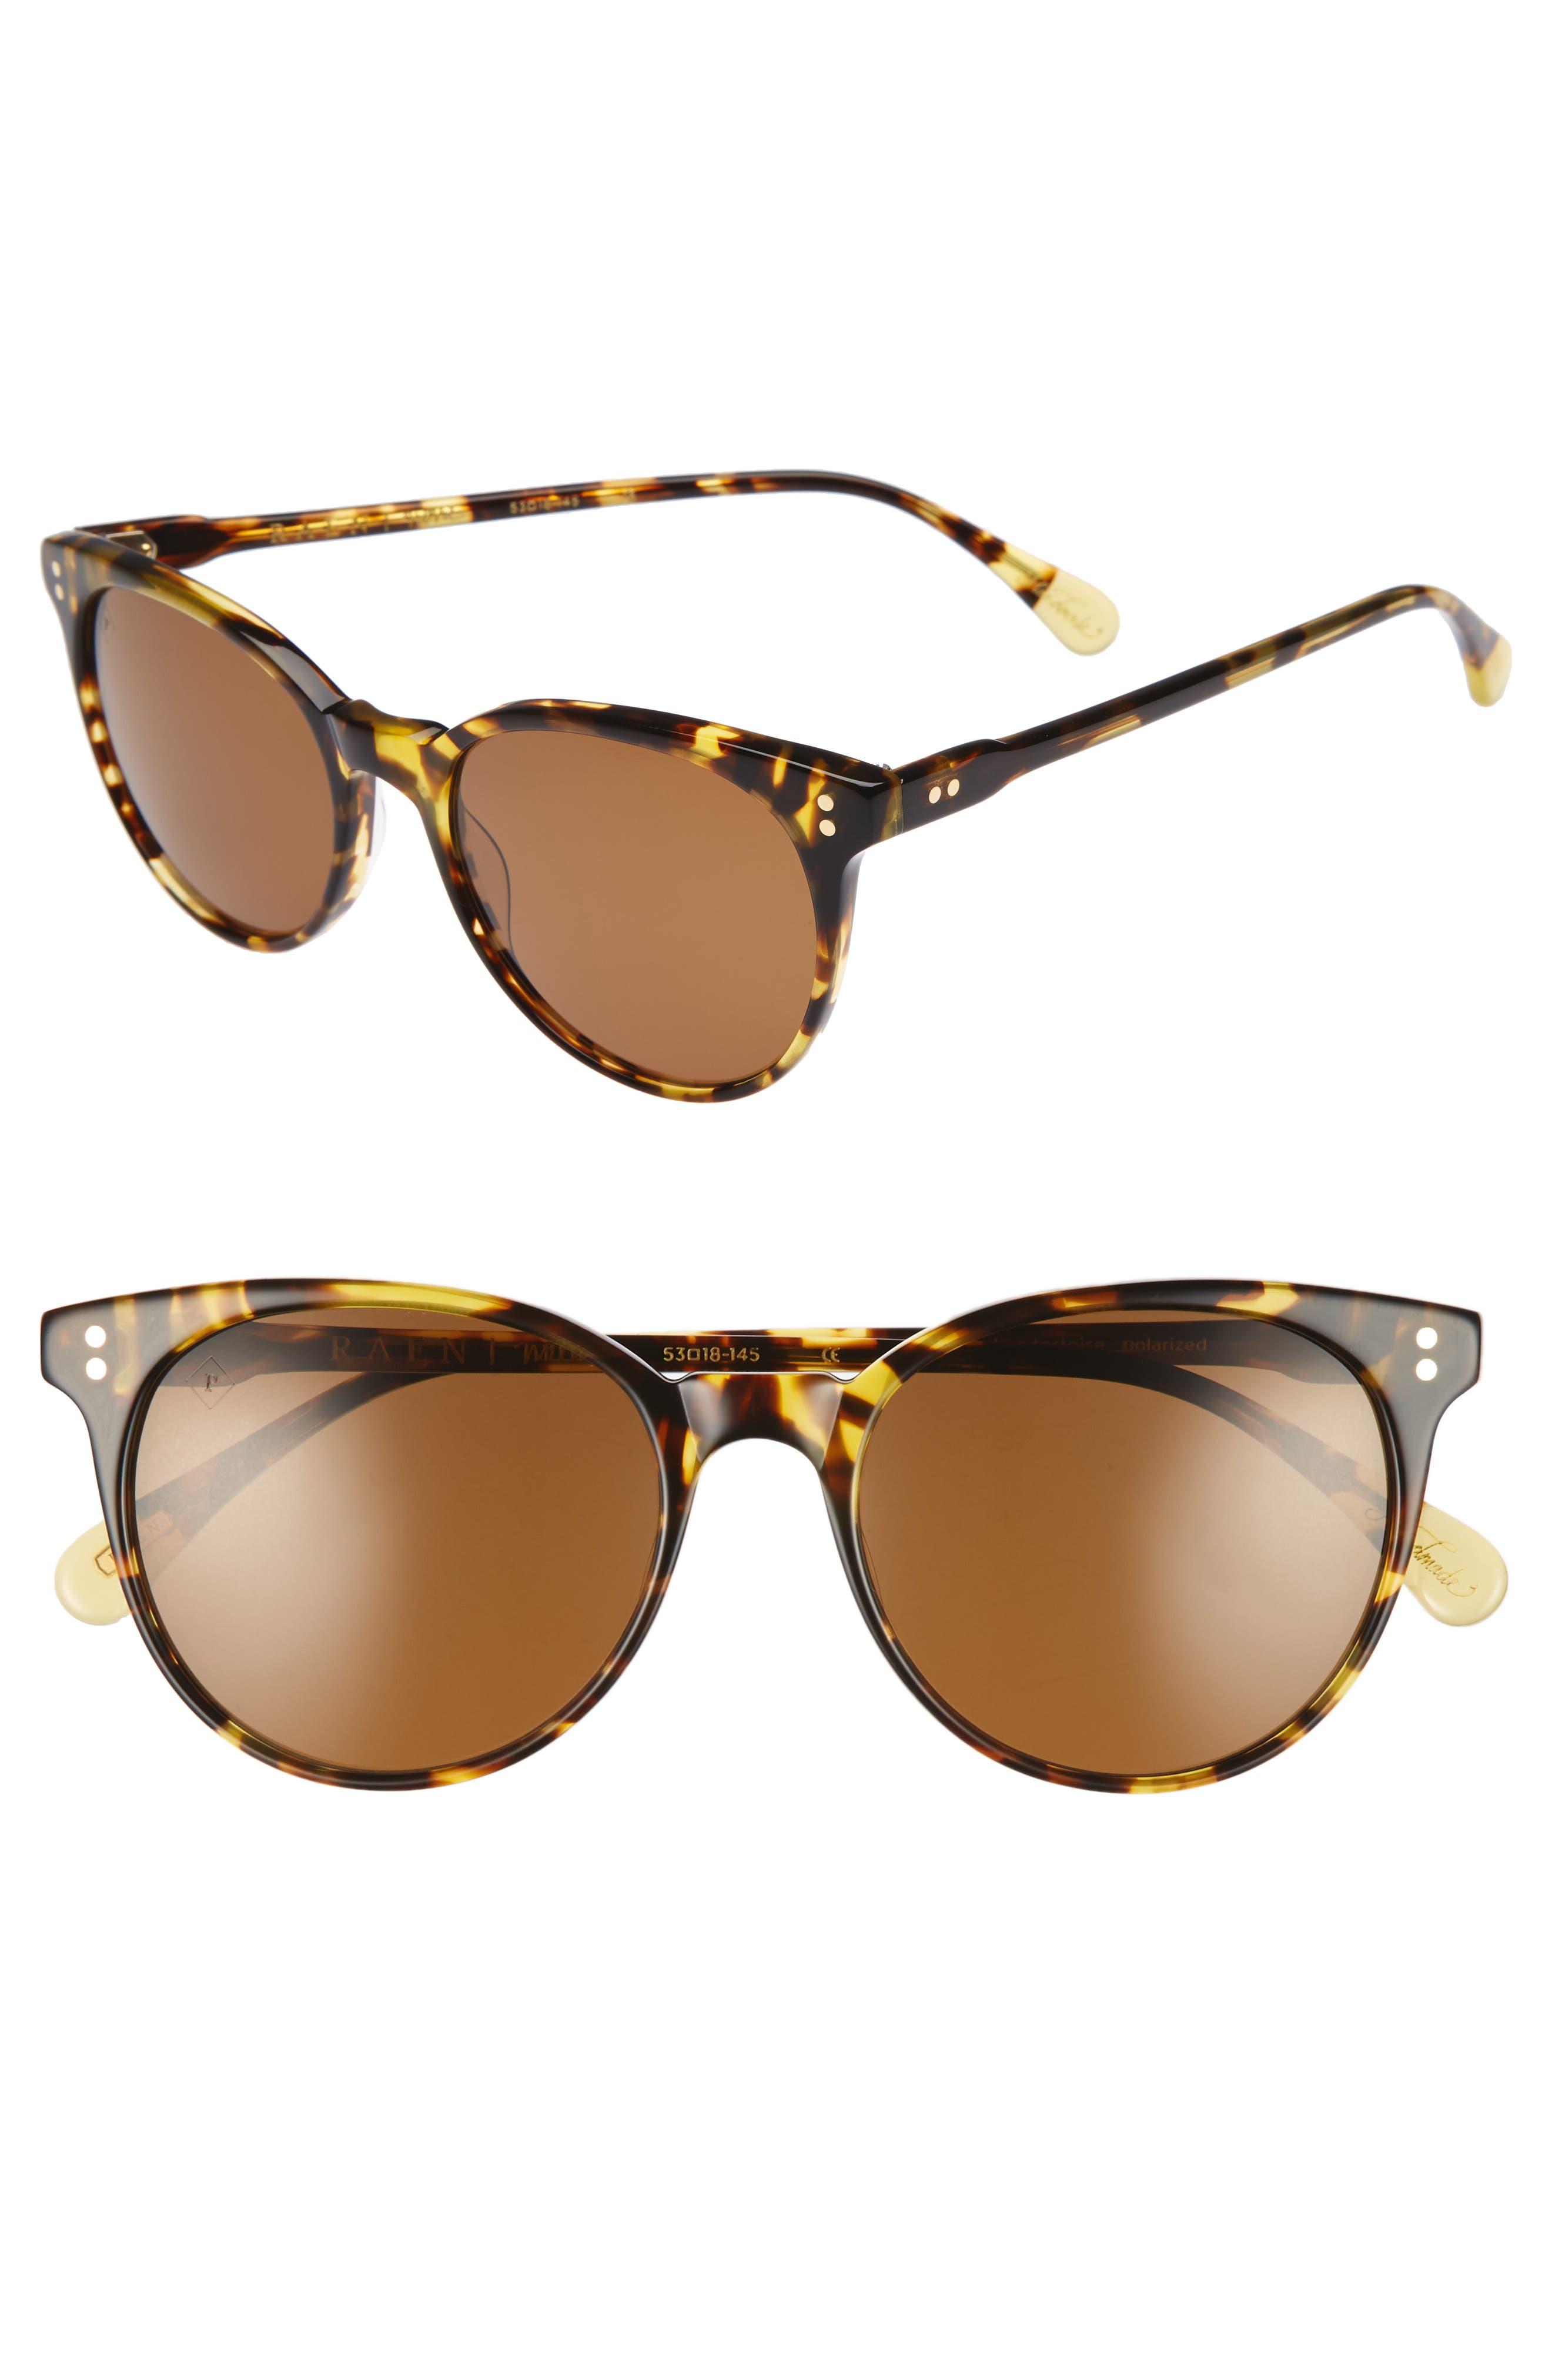 Norie 53mm Sunglasses,                             Main thumbnail 1, color,                             Tokyo Tortoise/ Brown